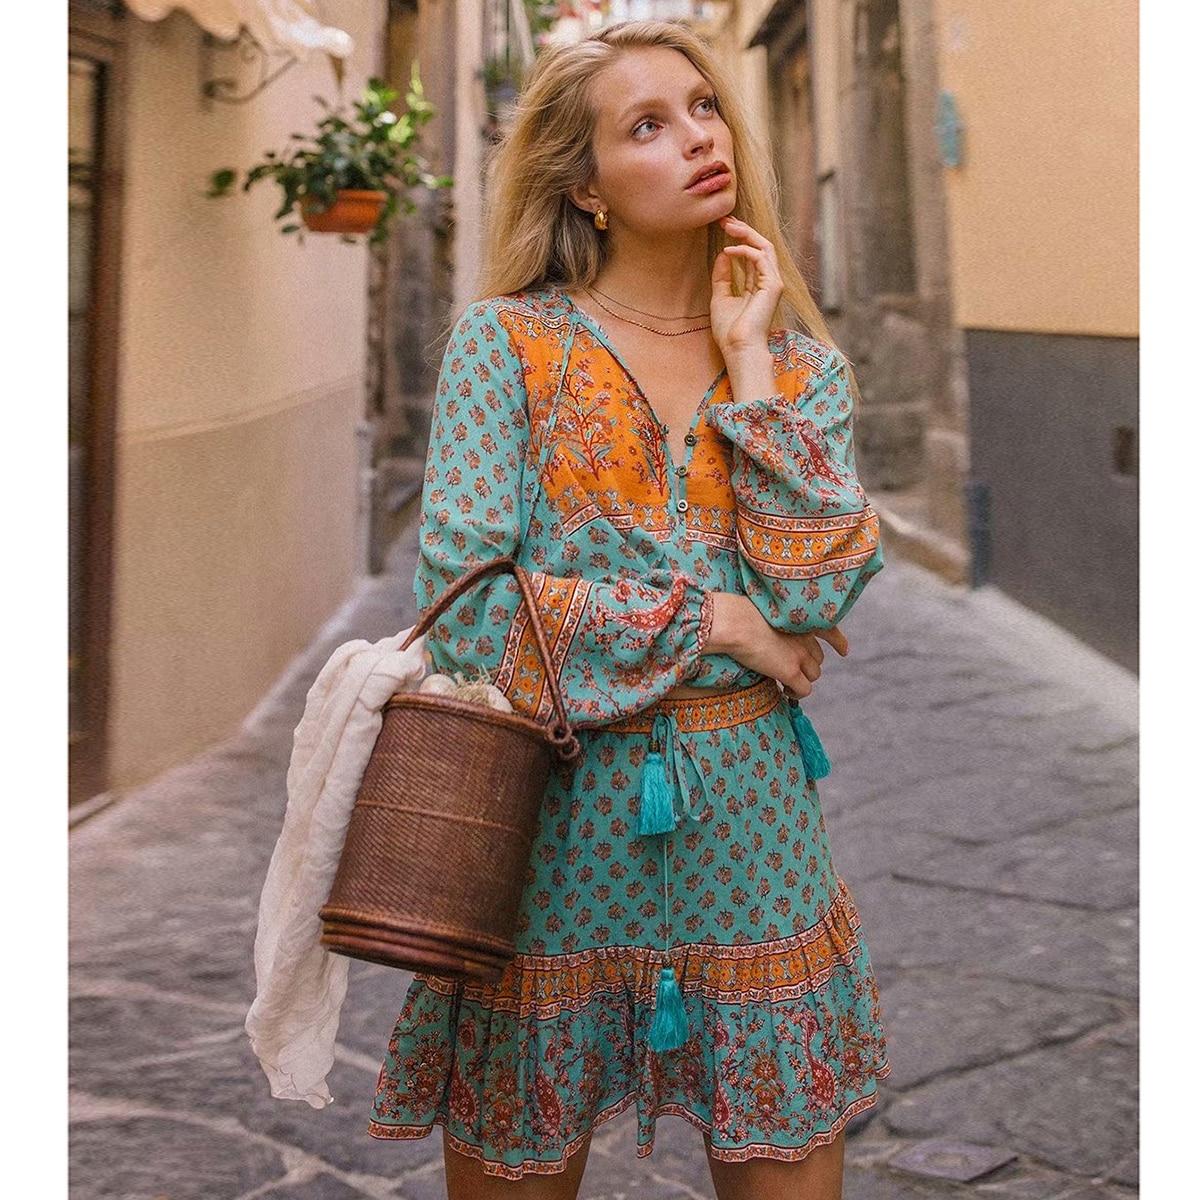 Boho Floral Print Two Pieces Set Summer Women Long Sleeve V Neck Vintage Blouse Tassel  Elastic Skirt Set Beach Clothes 2019